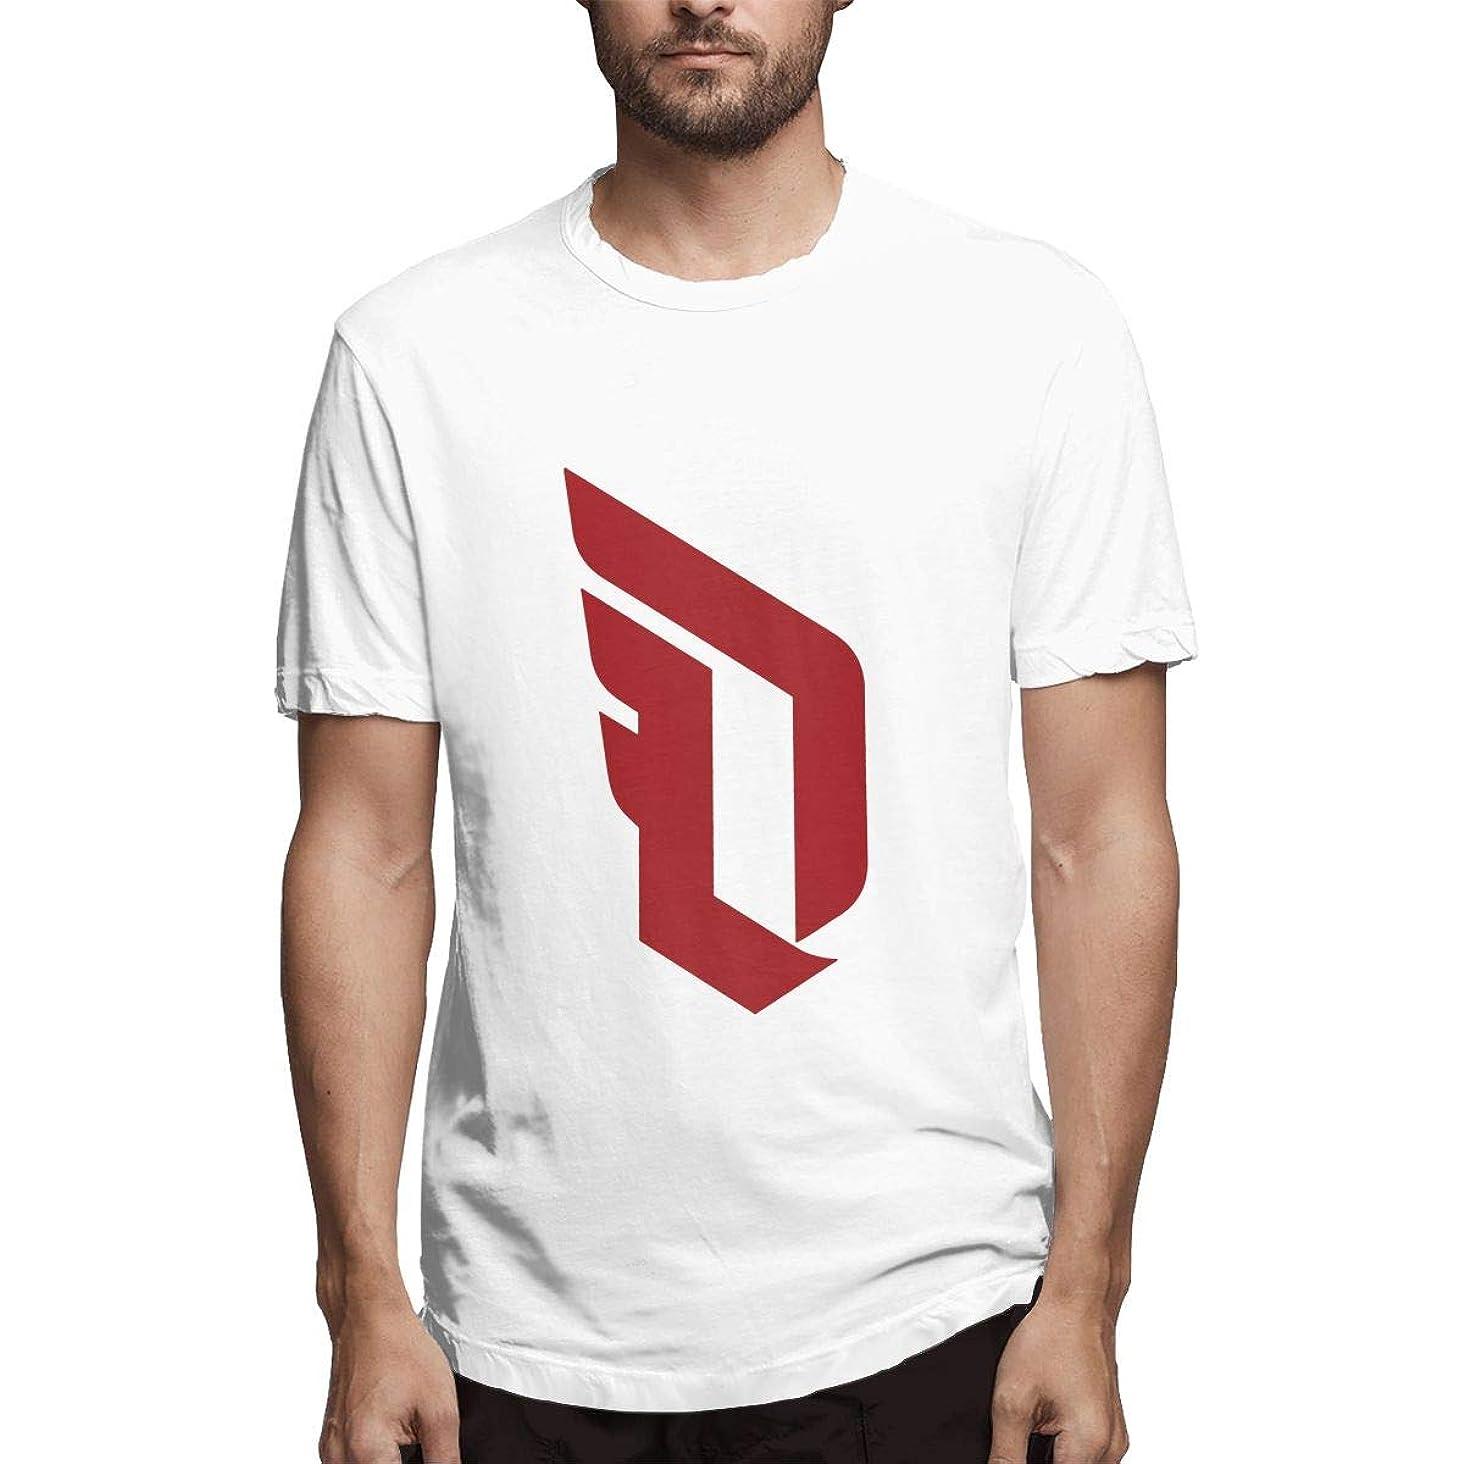 Men's Never-Doubt Dame-Time Damian-Lillard Short-Sleeve Classic Comfort Soft Crewneck T-Shirt